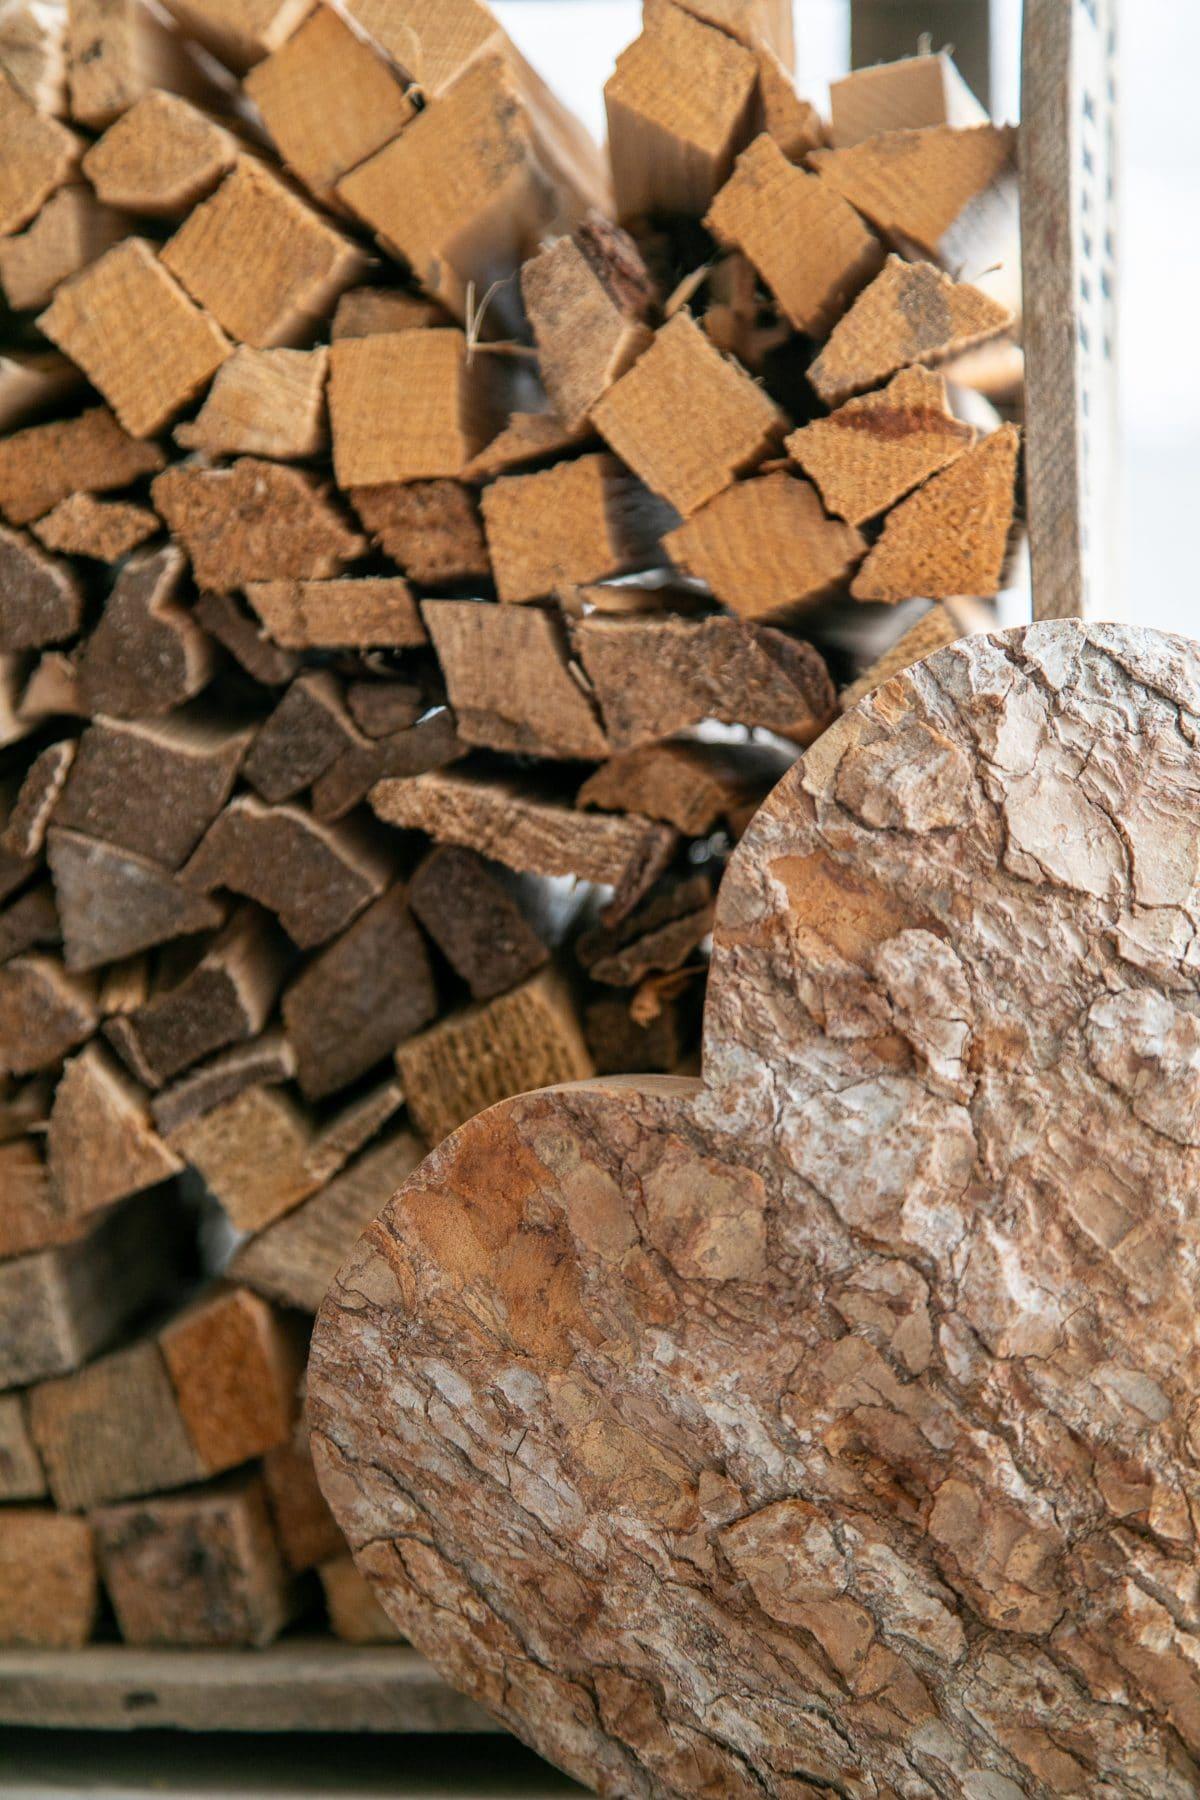 Holz, Heimatliebe, Naturverbunden